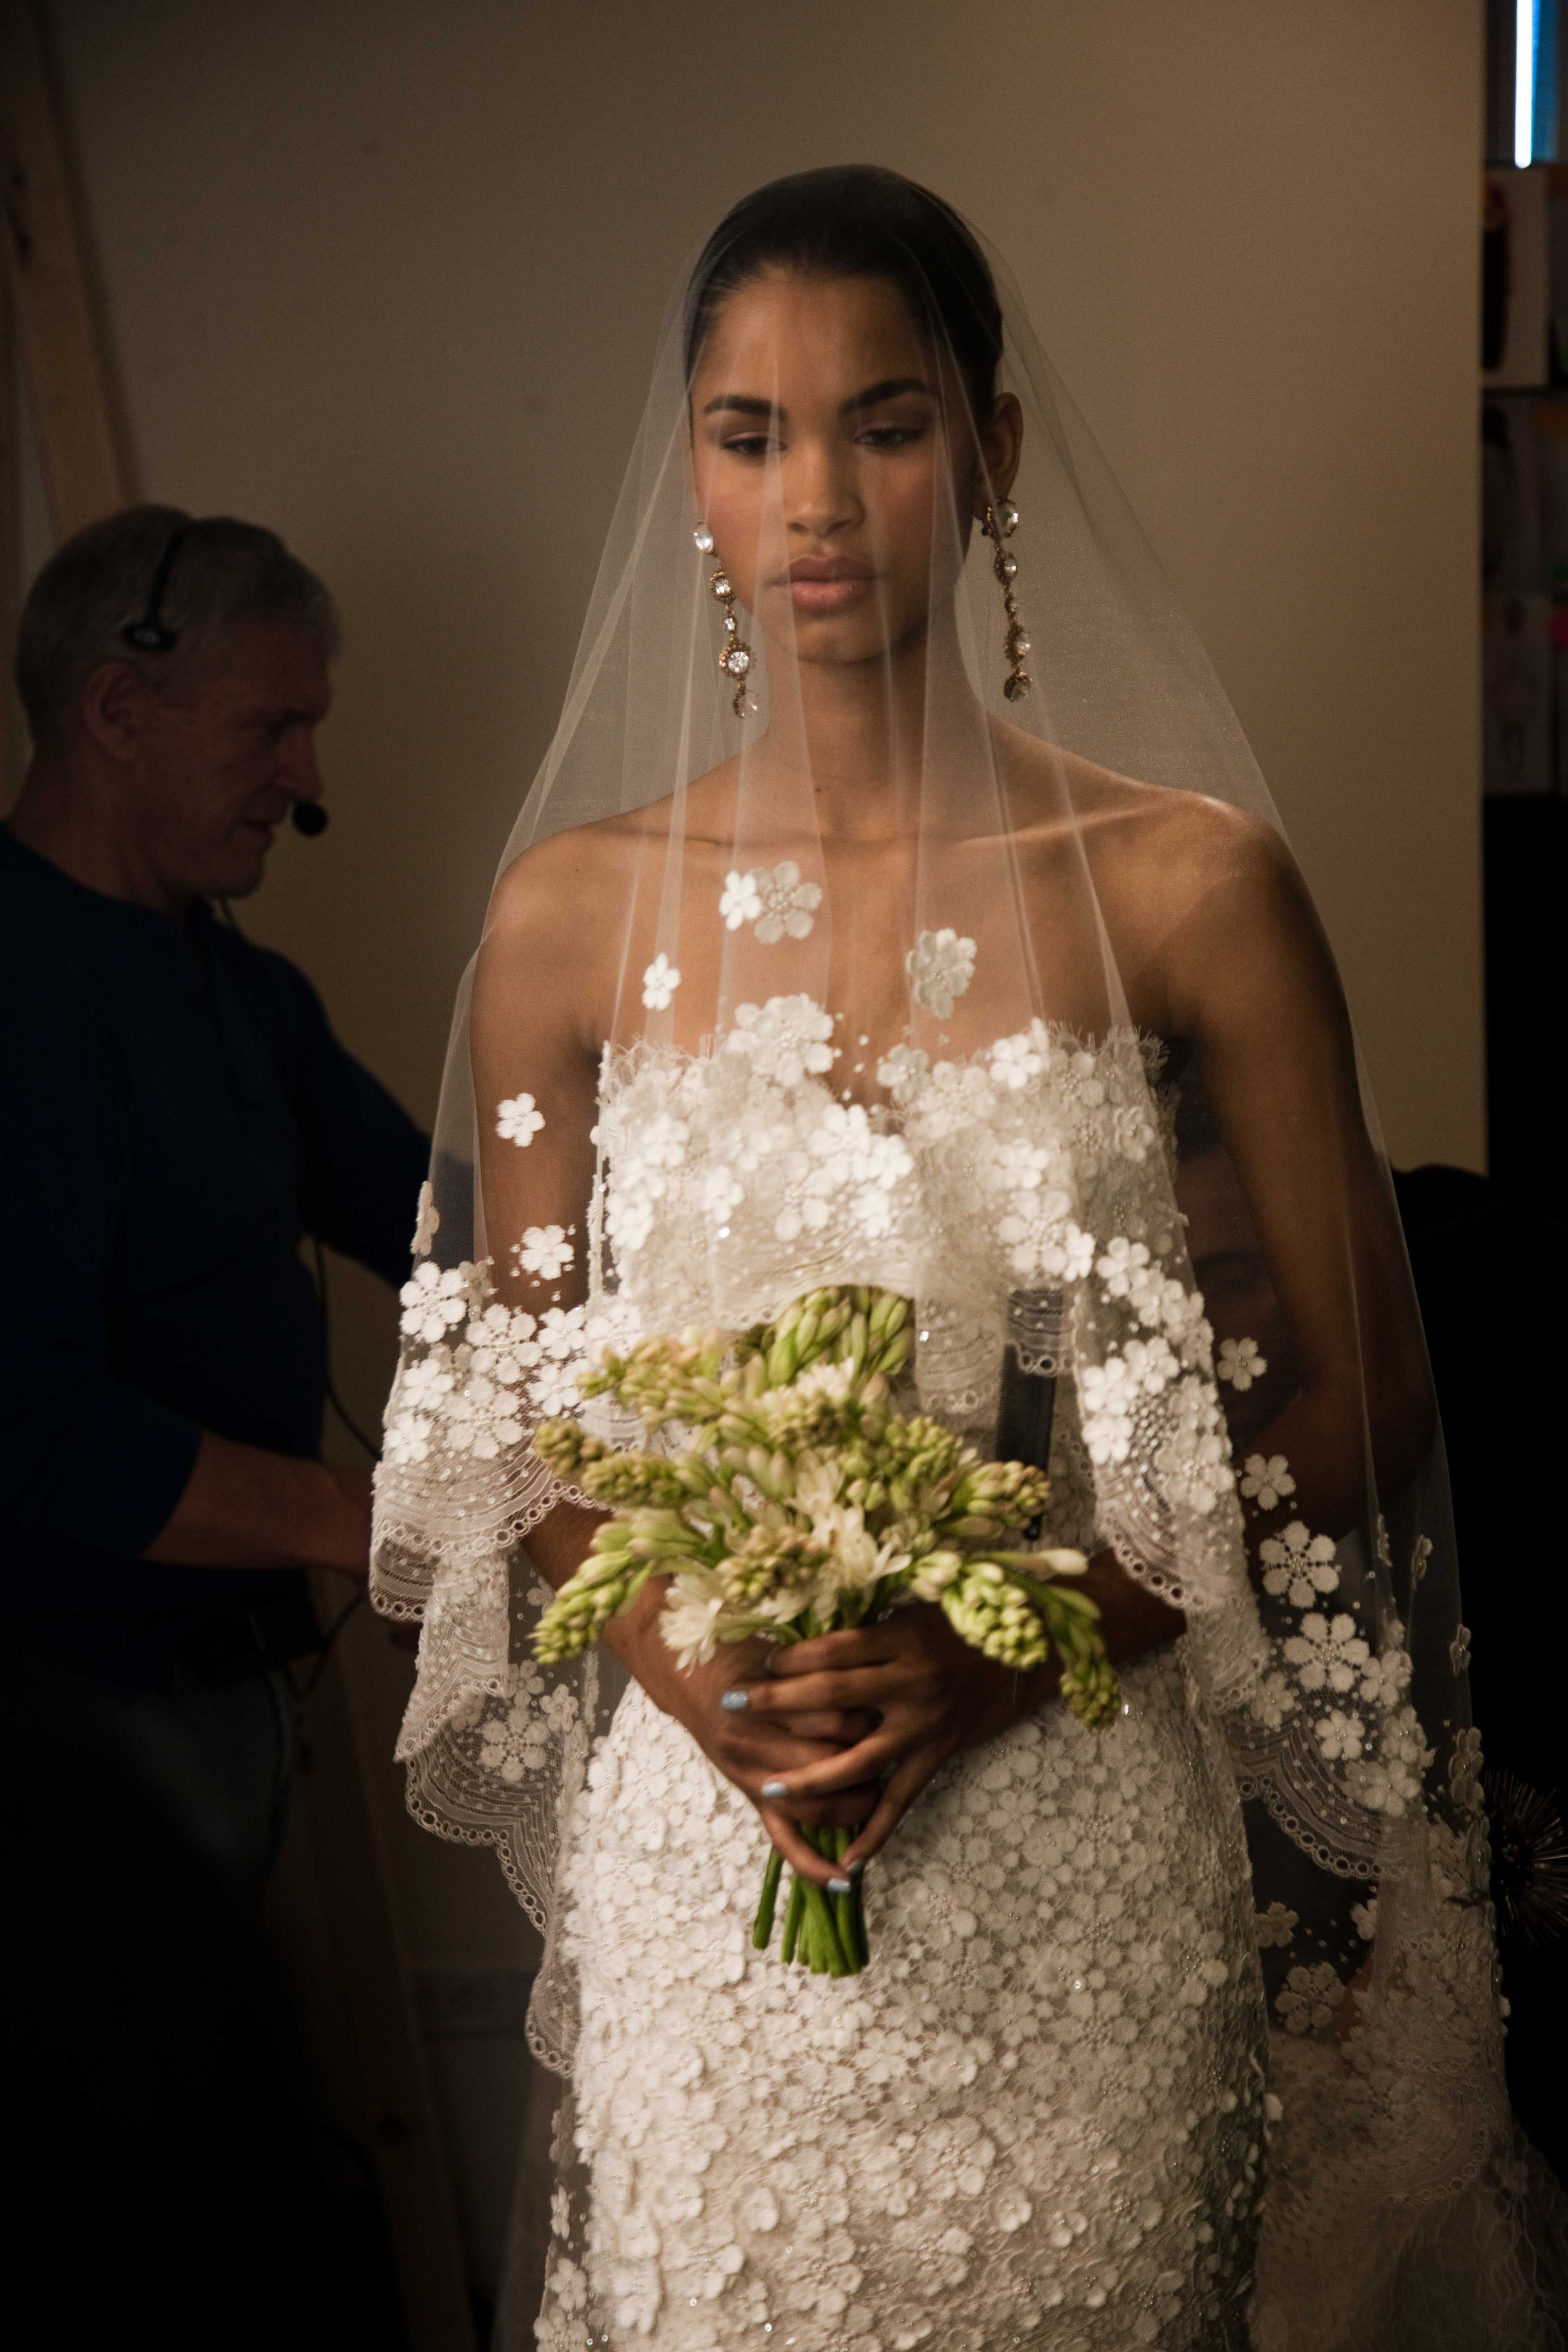 Oscar de la Renta, 44E10, Size 2 | Oscar de la Renta, Wedding dress ...